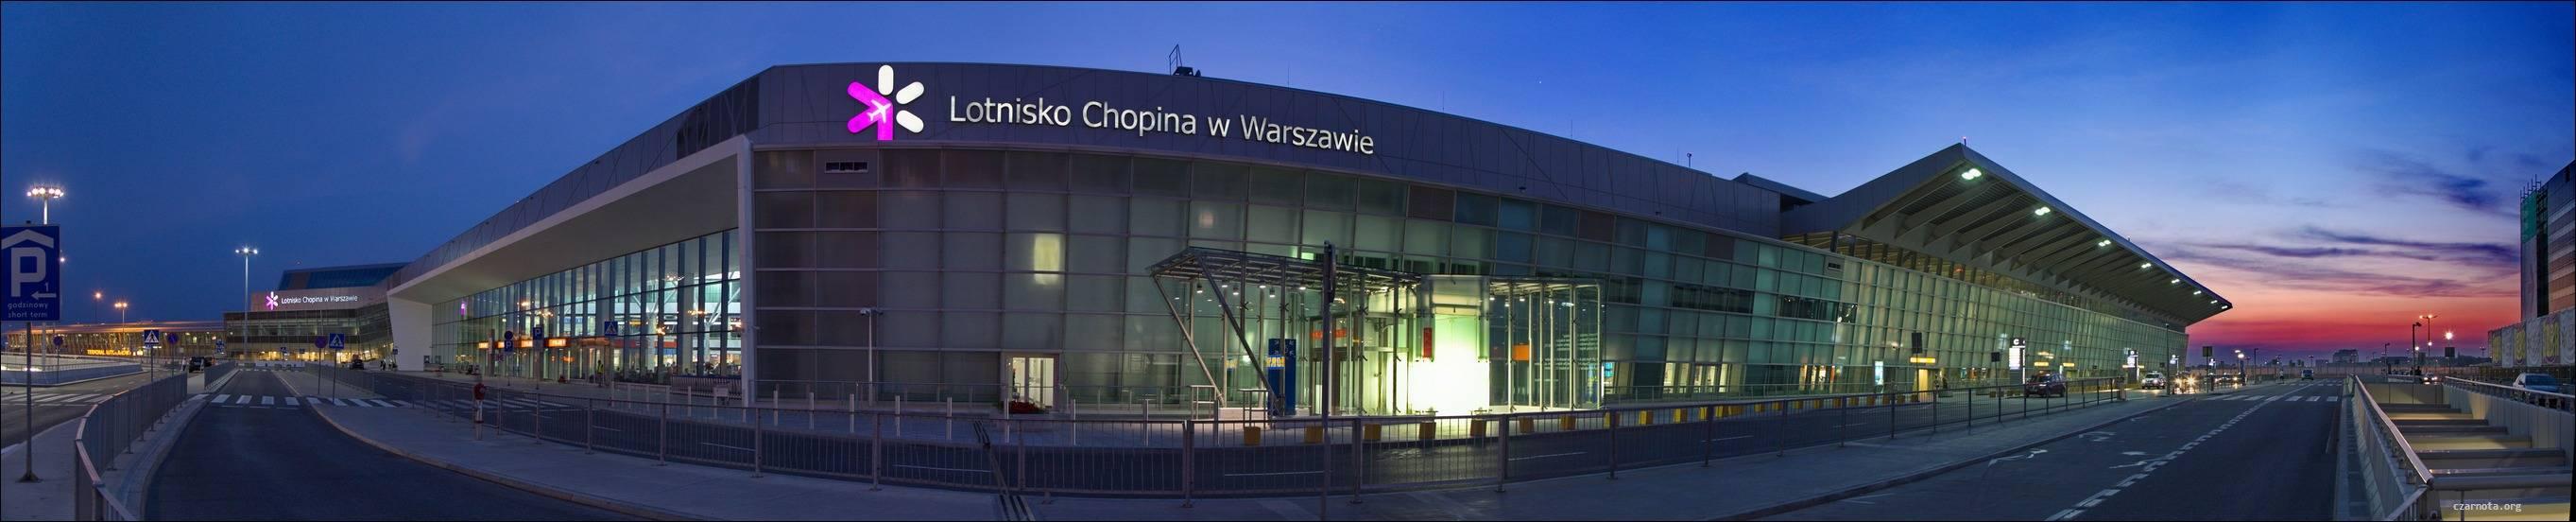 Аэропорт им. фредерика шопена (frederic chopin), варшава, заказ авиабилетов